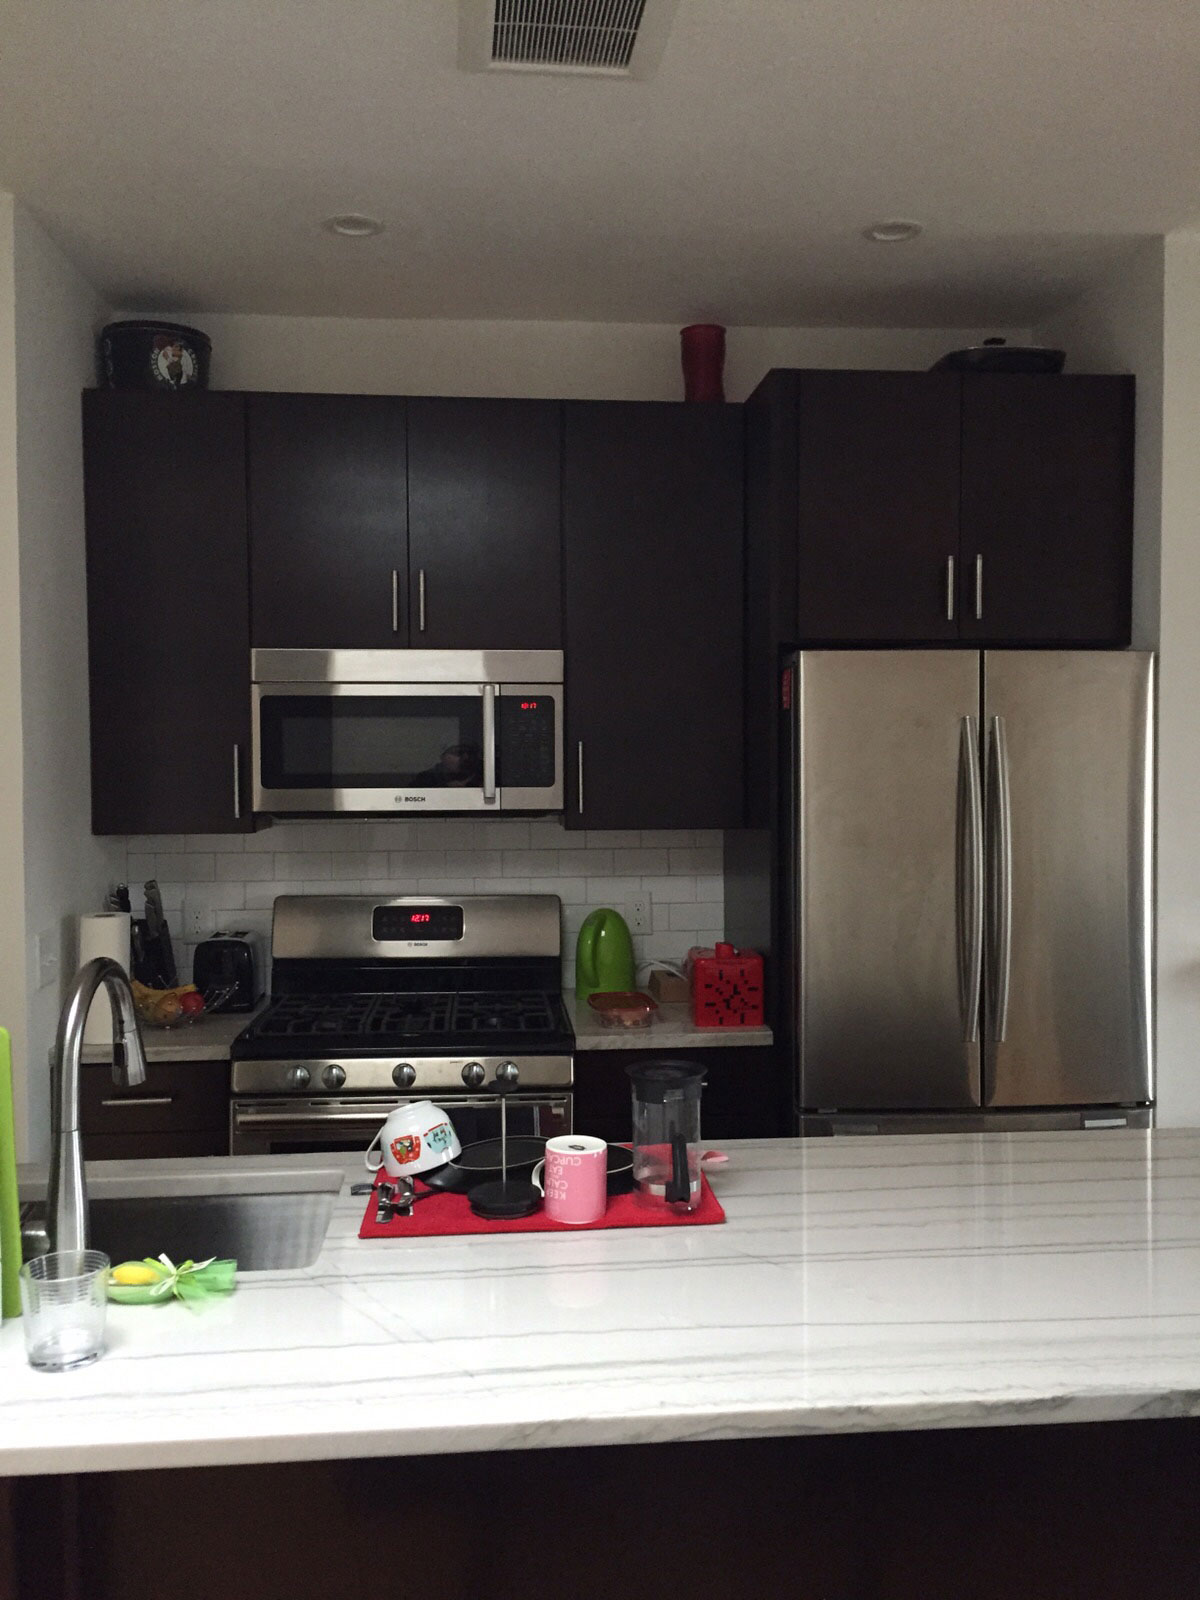 Boston Condo Kitchen Remodel - Bay State Refinishing & Remodeling